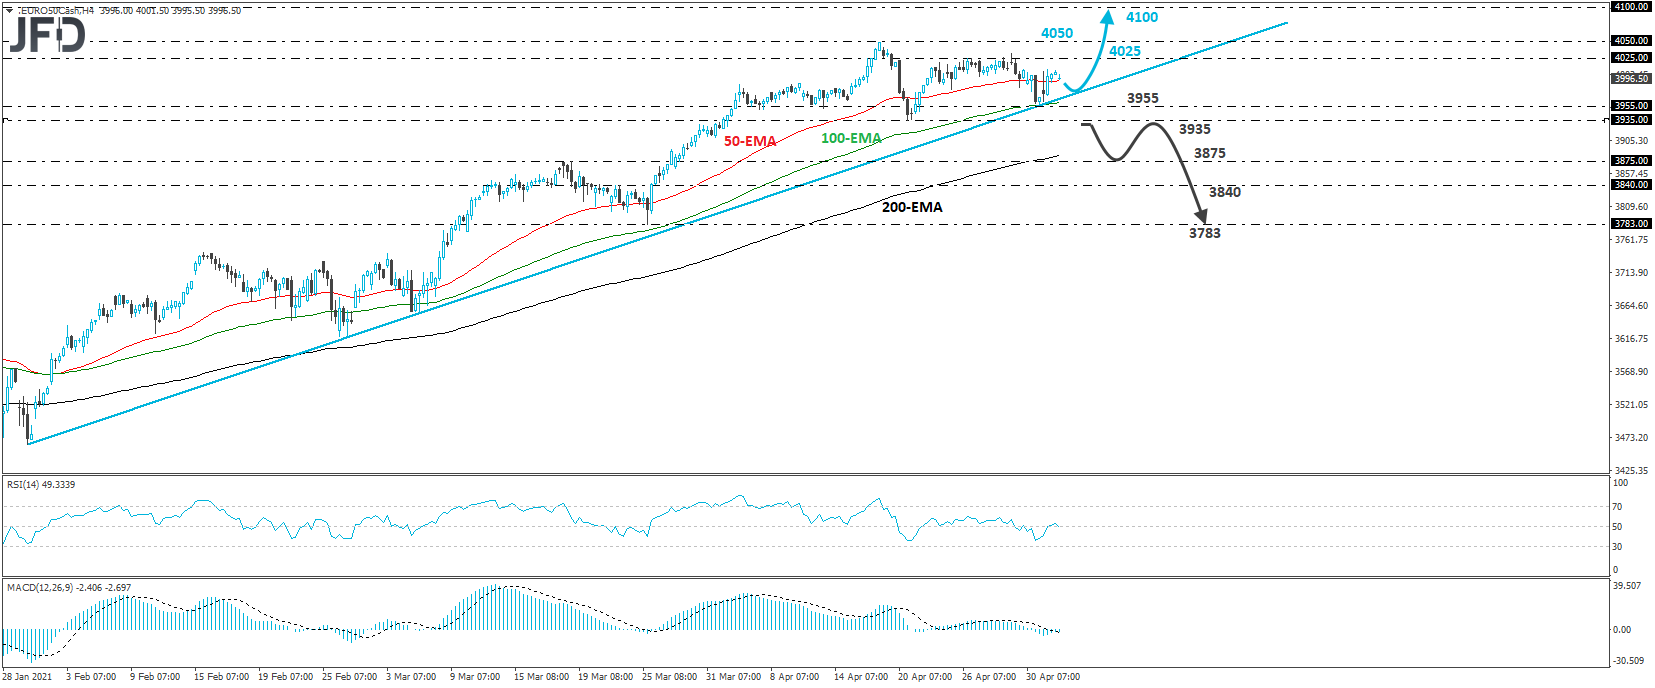 Euro stoxx 50 4-hour chart technical analysis